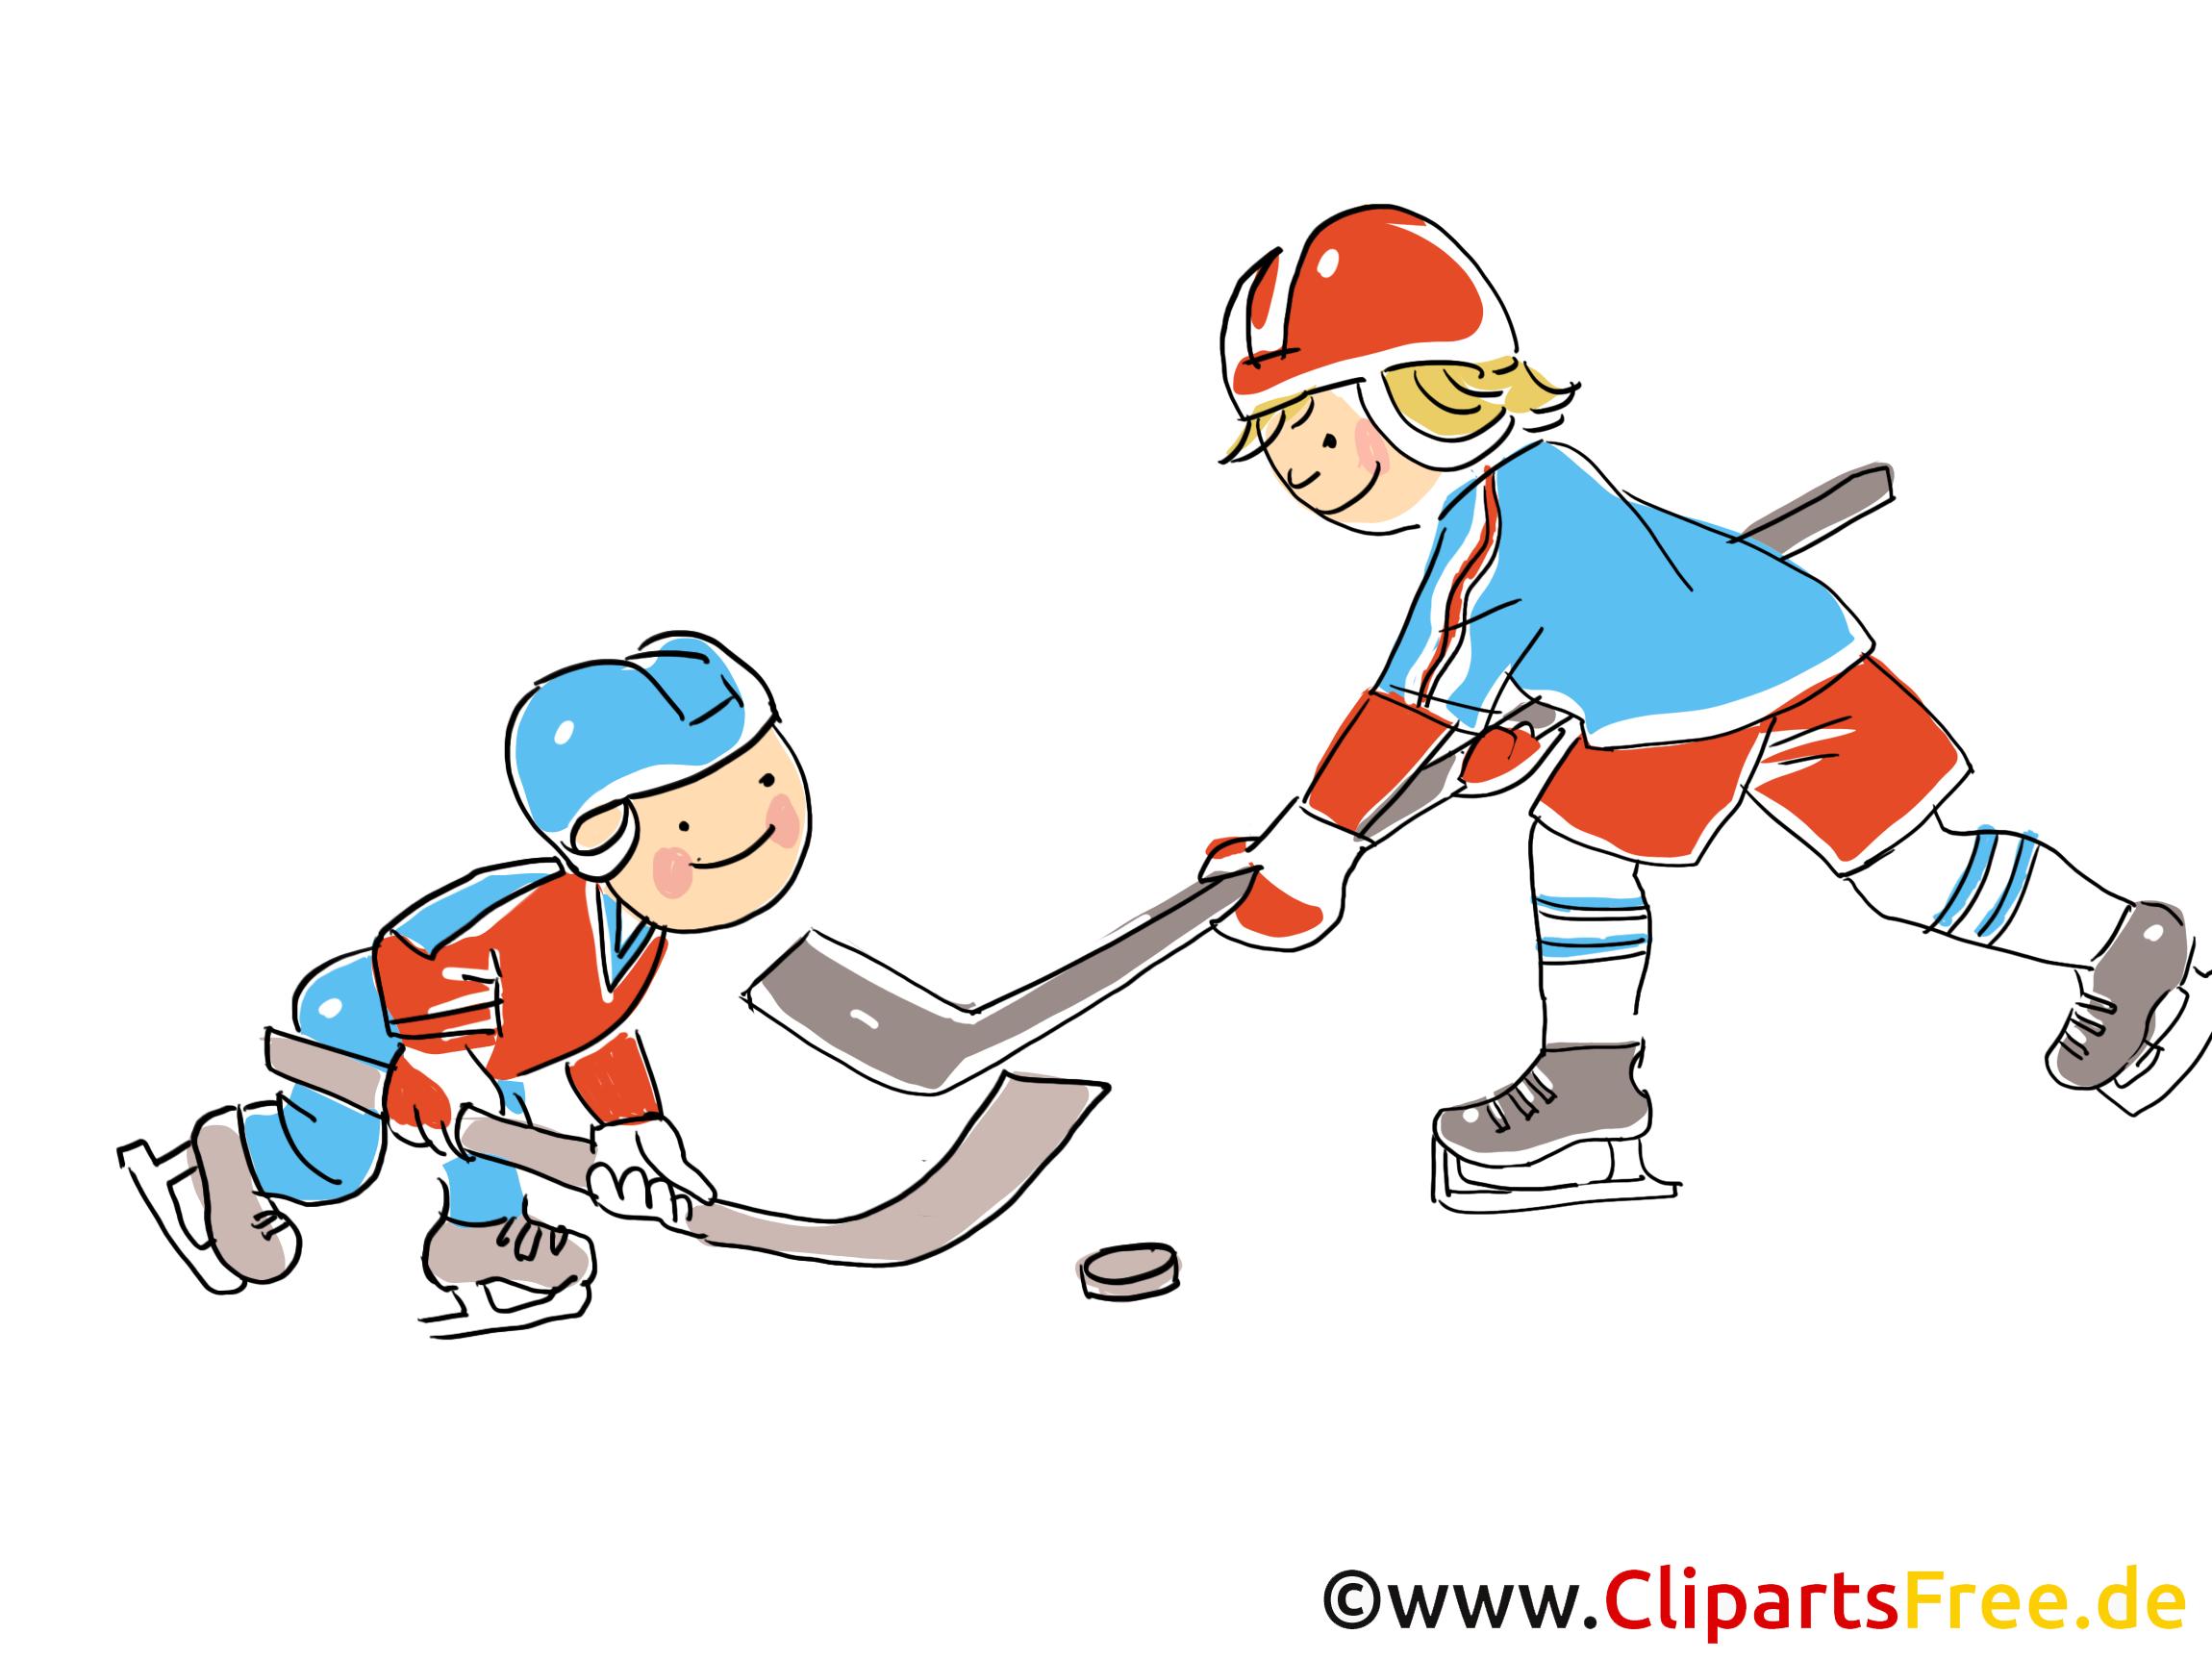 Eishockey WM  Bild, Illustration, Clipart, Comic, Cartoon gratis